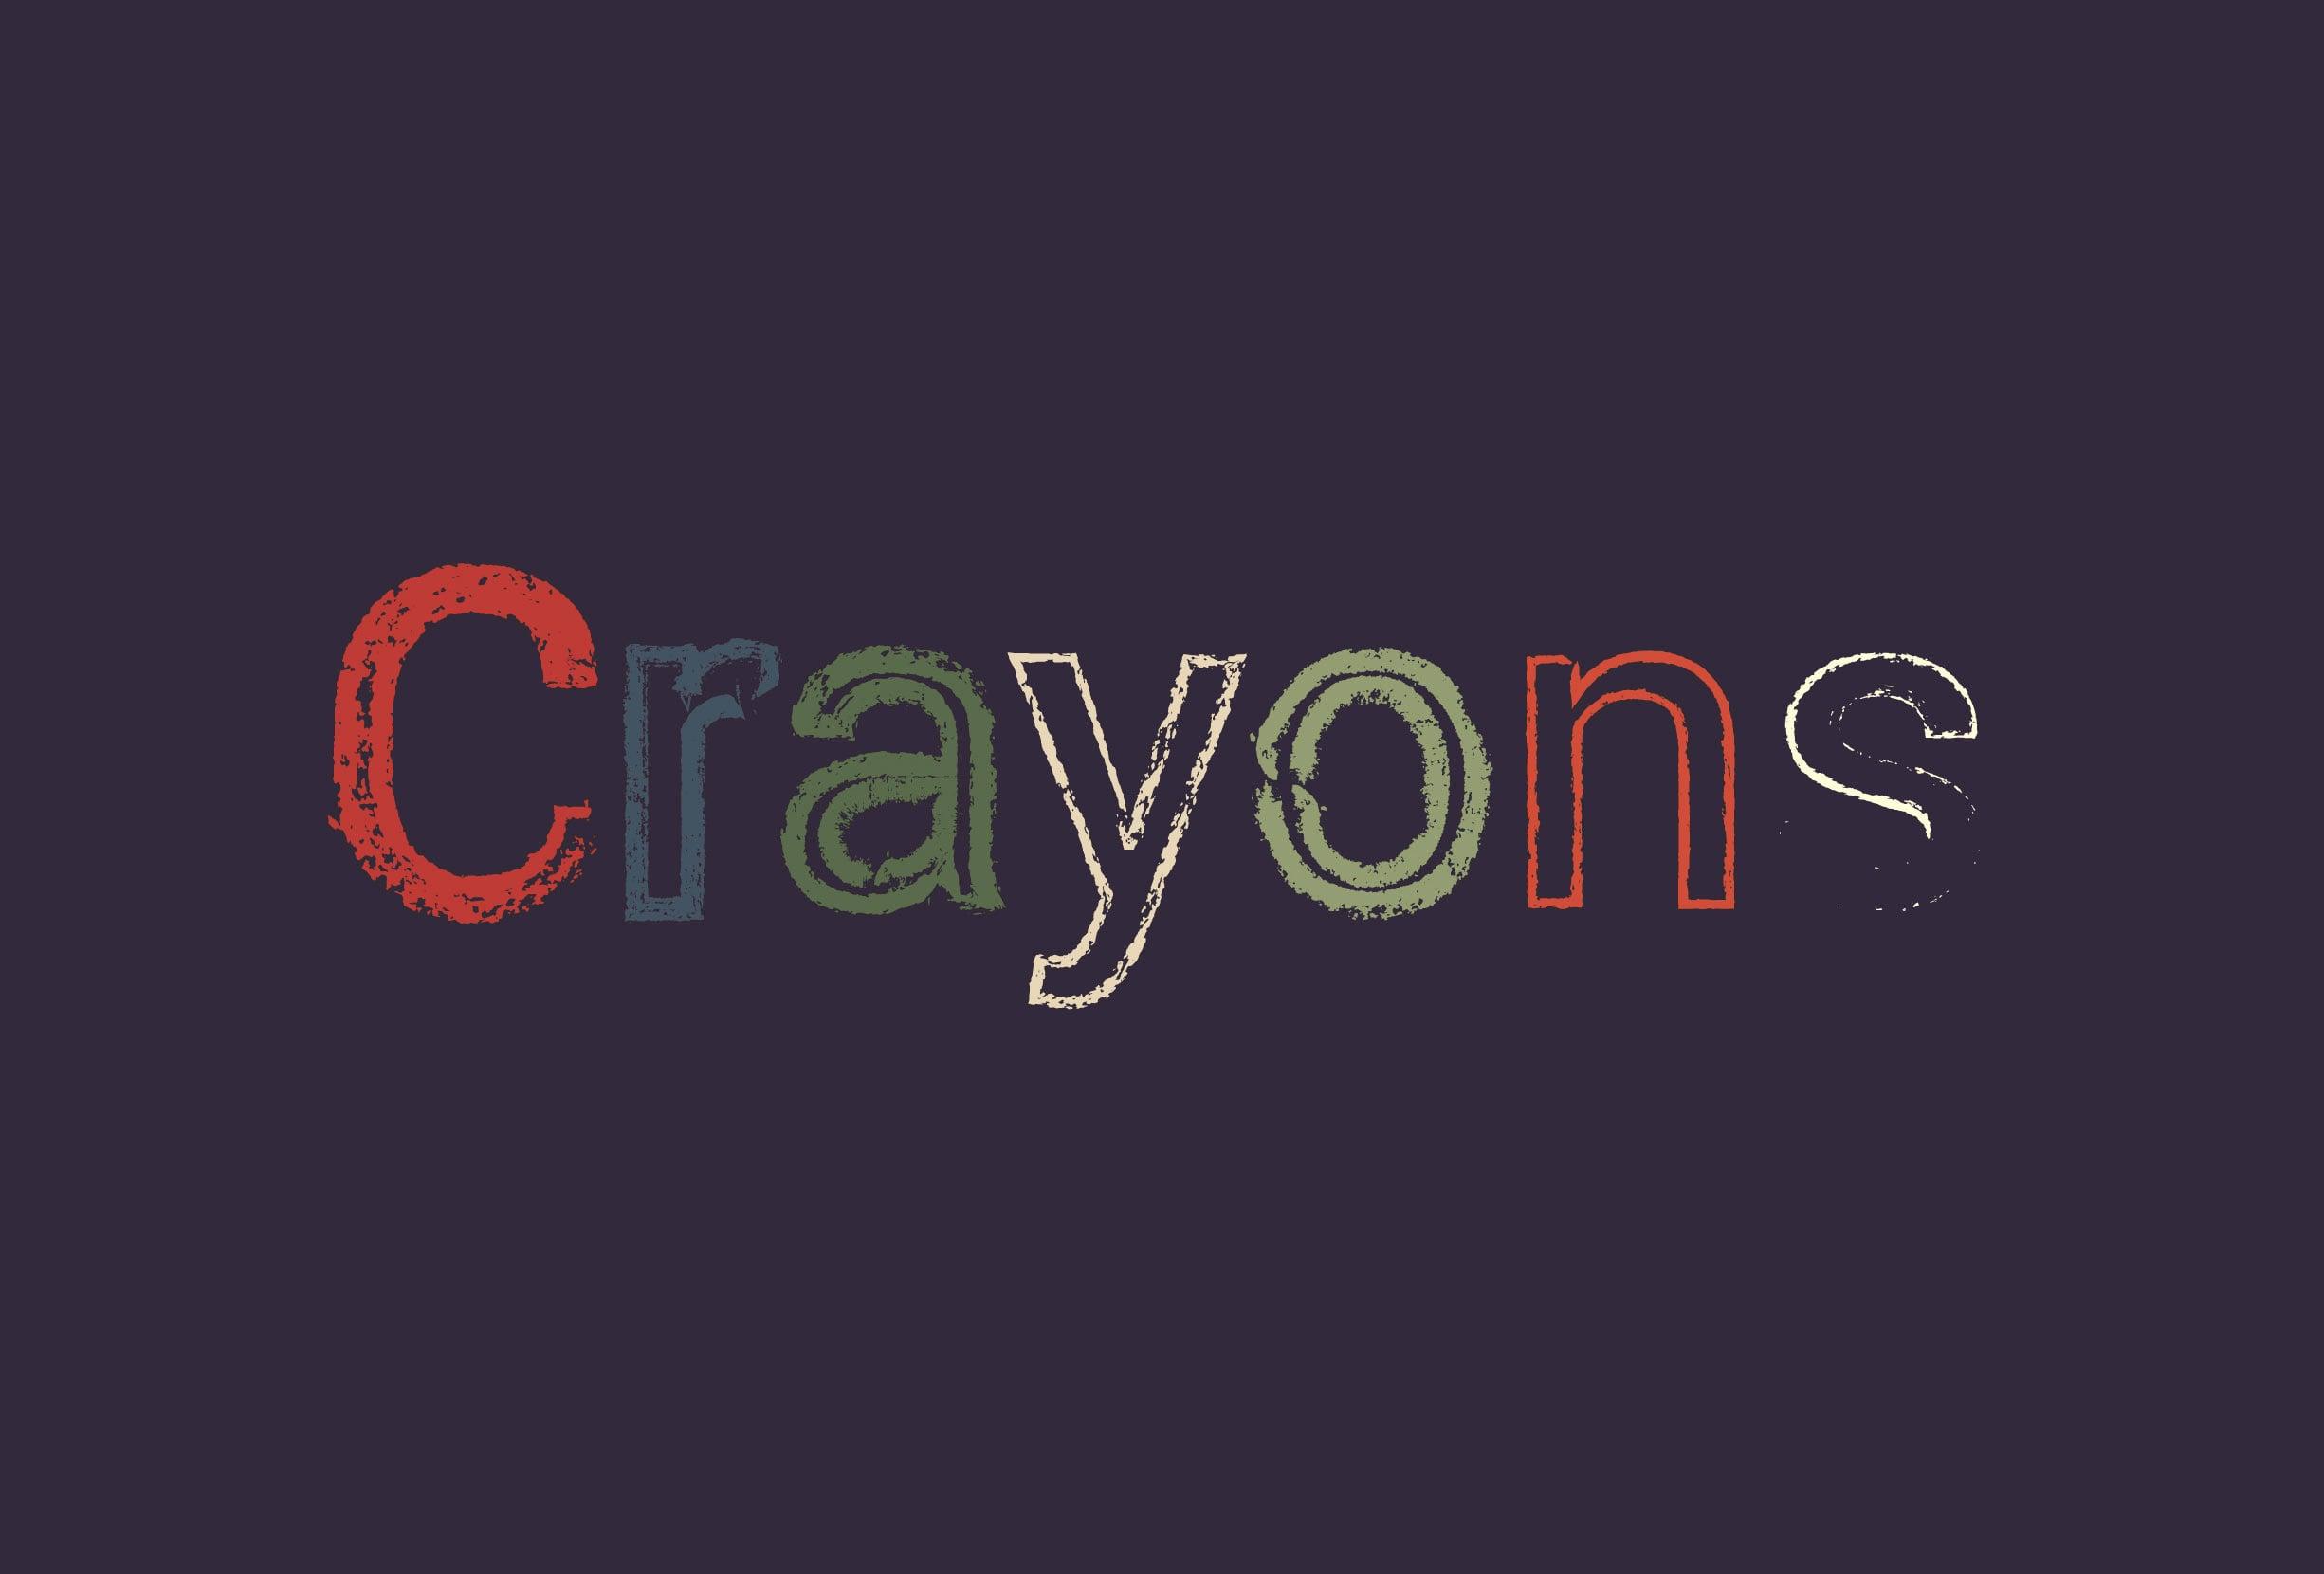 30 Best Line Art Illustrator Brushes (Wax Crayons) - brushes presentation 11111 0